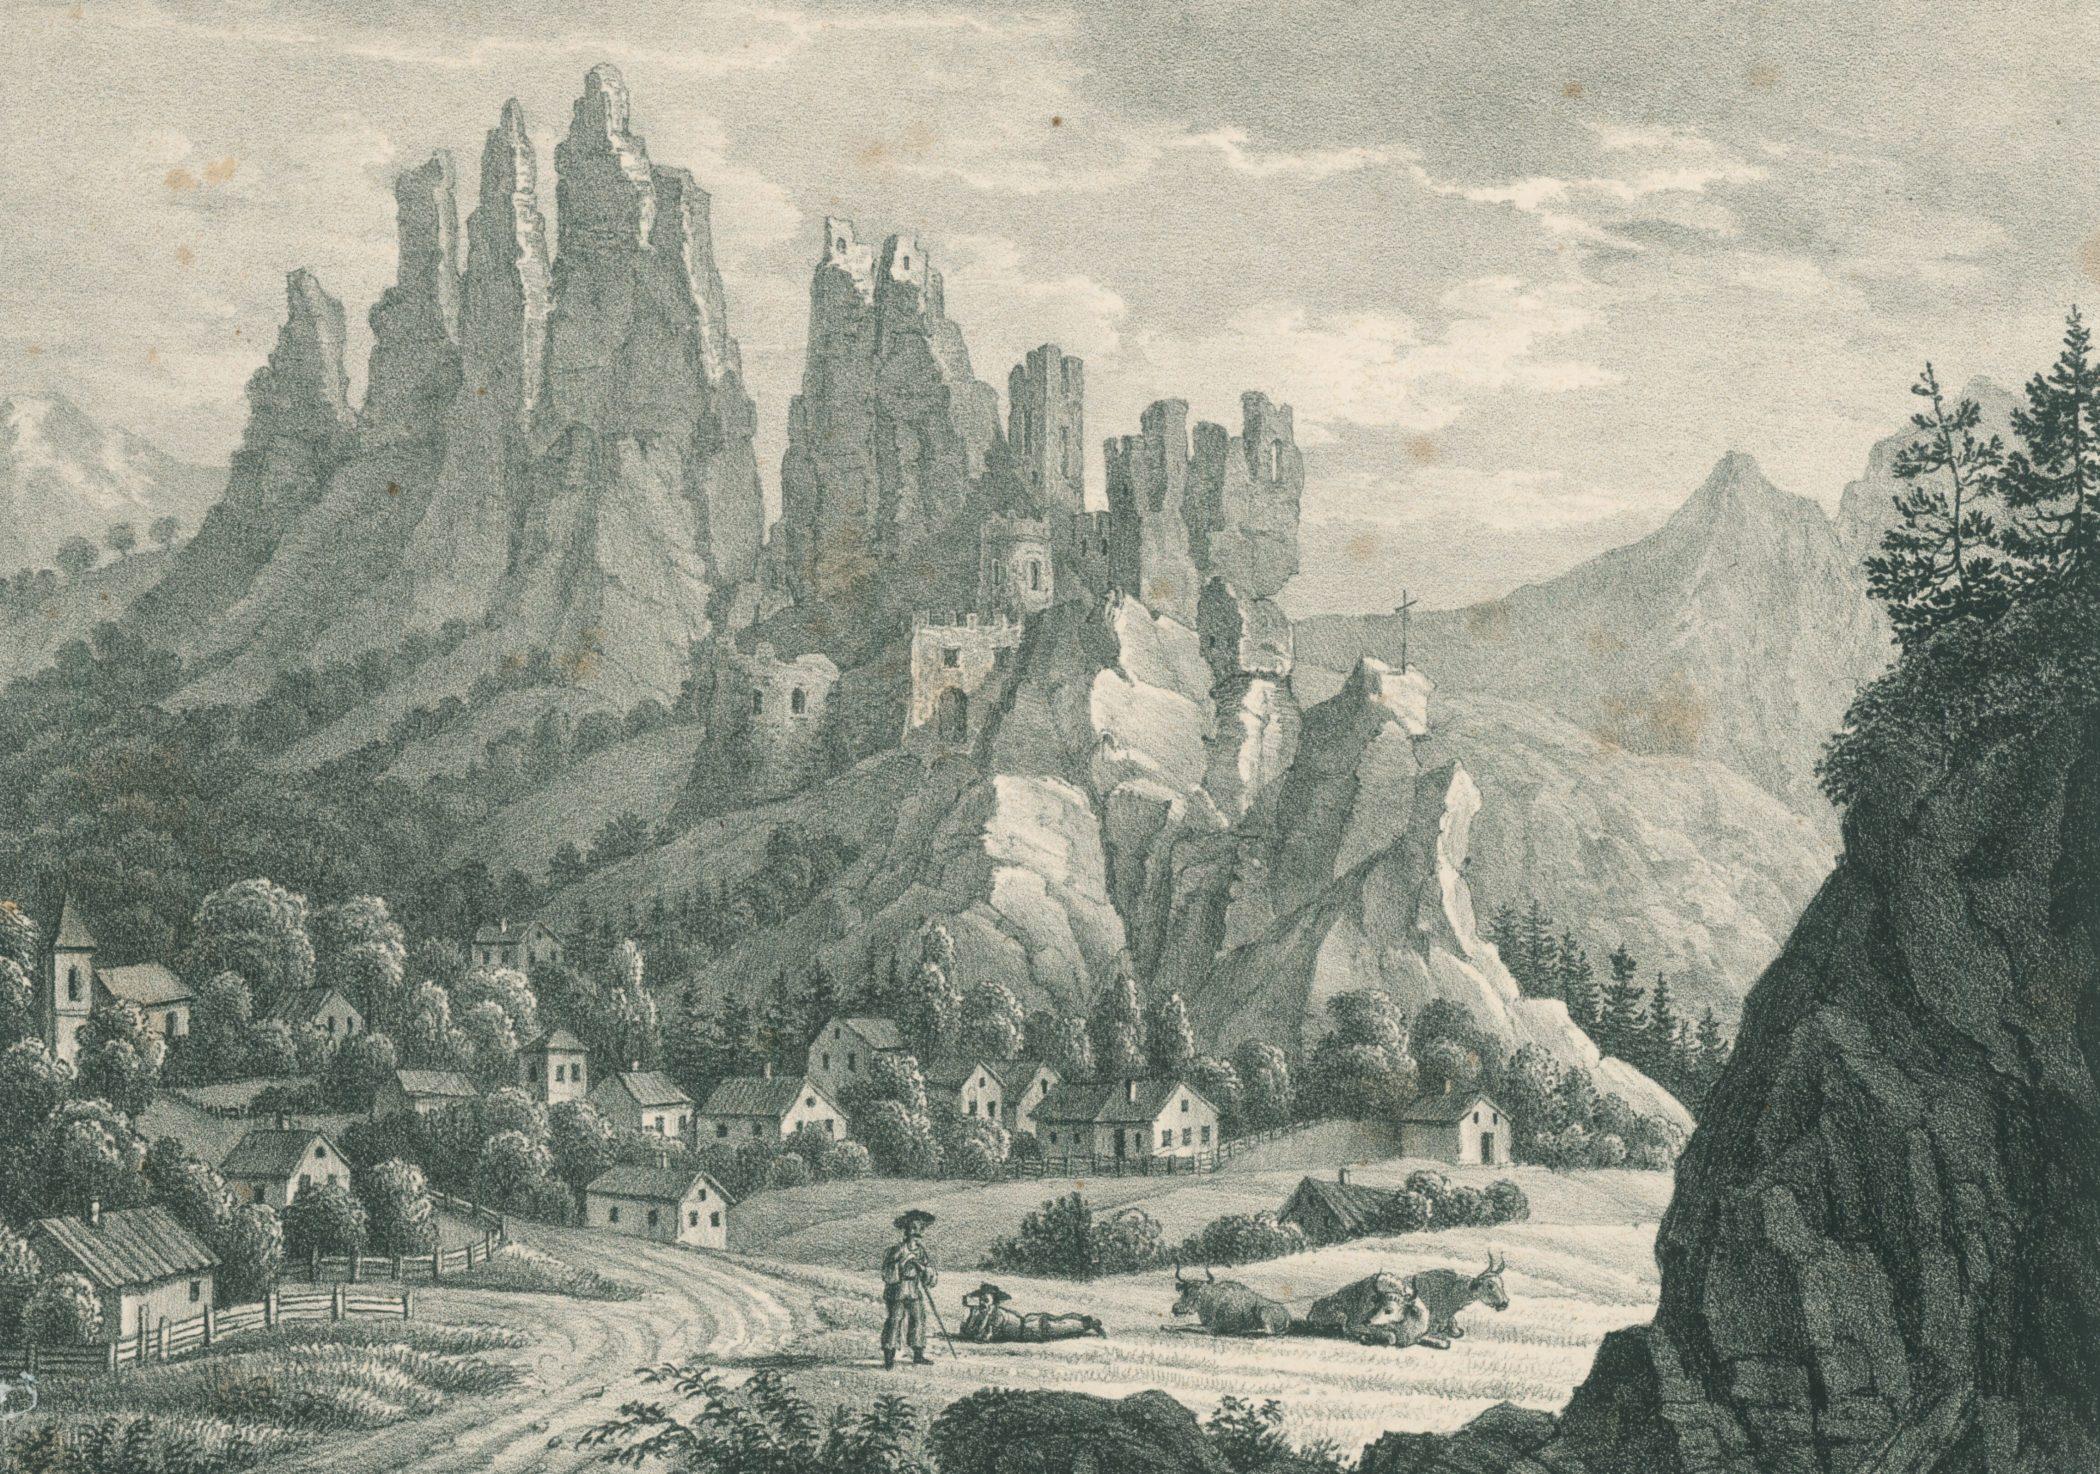 Hrad Lednica okolo roku 1830